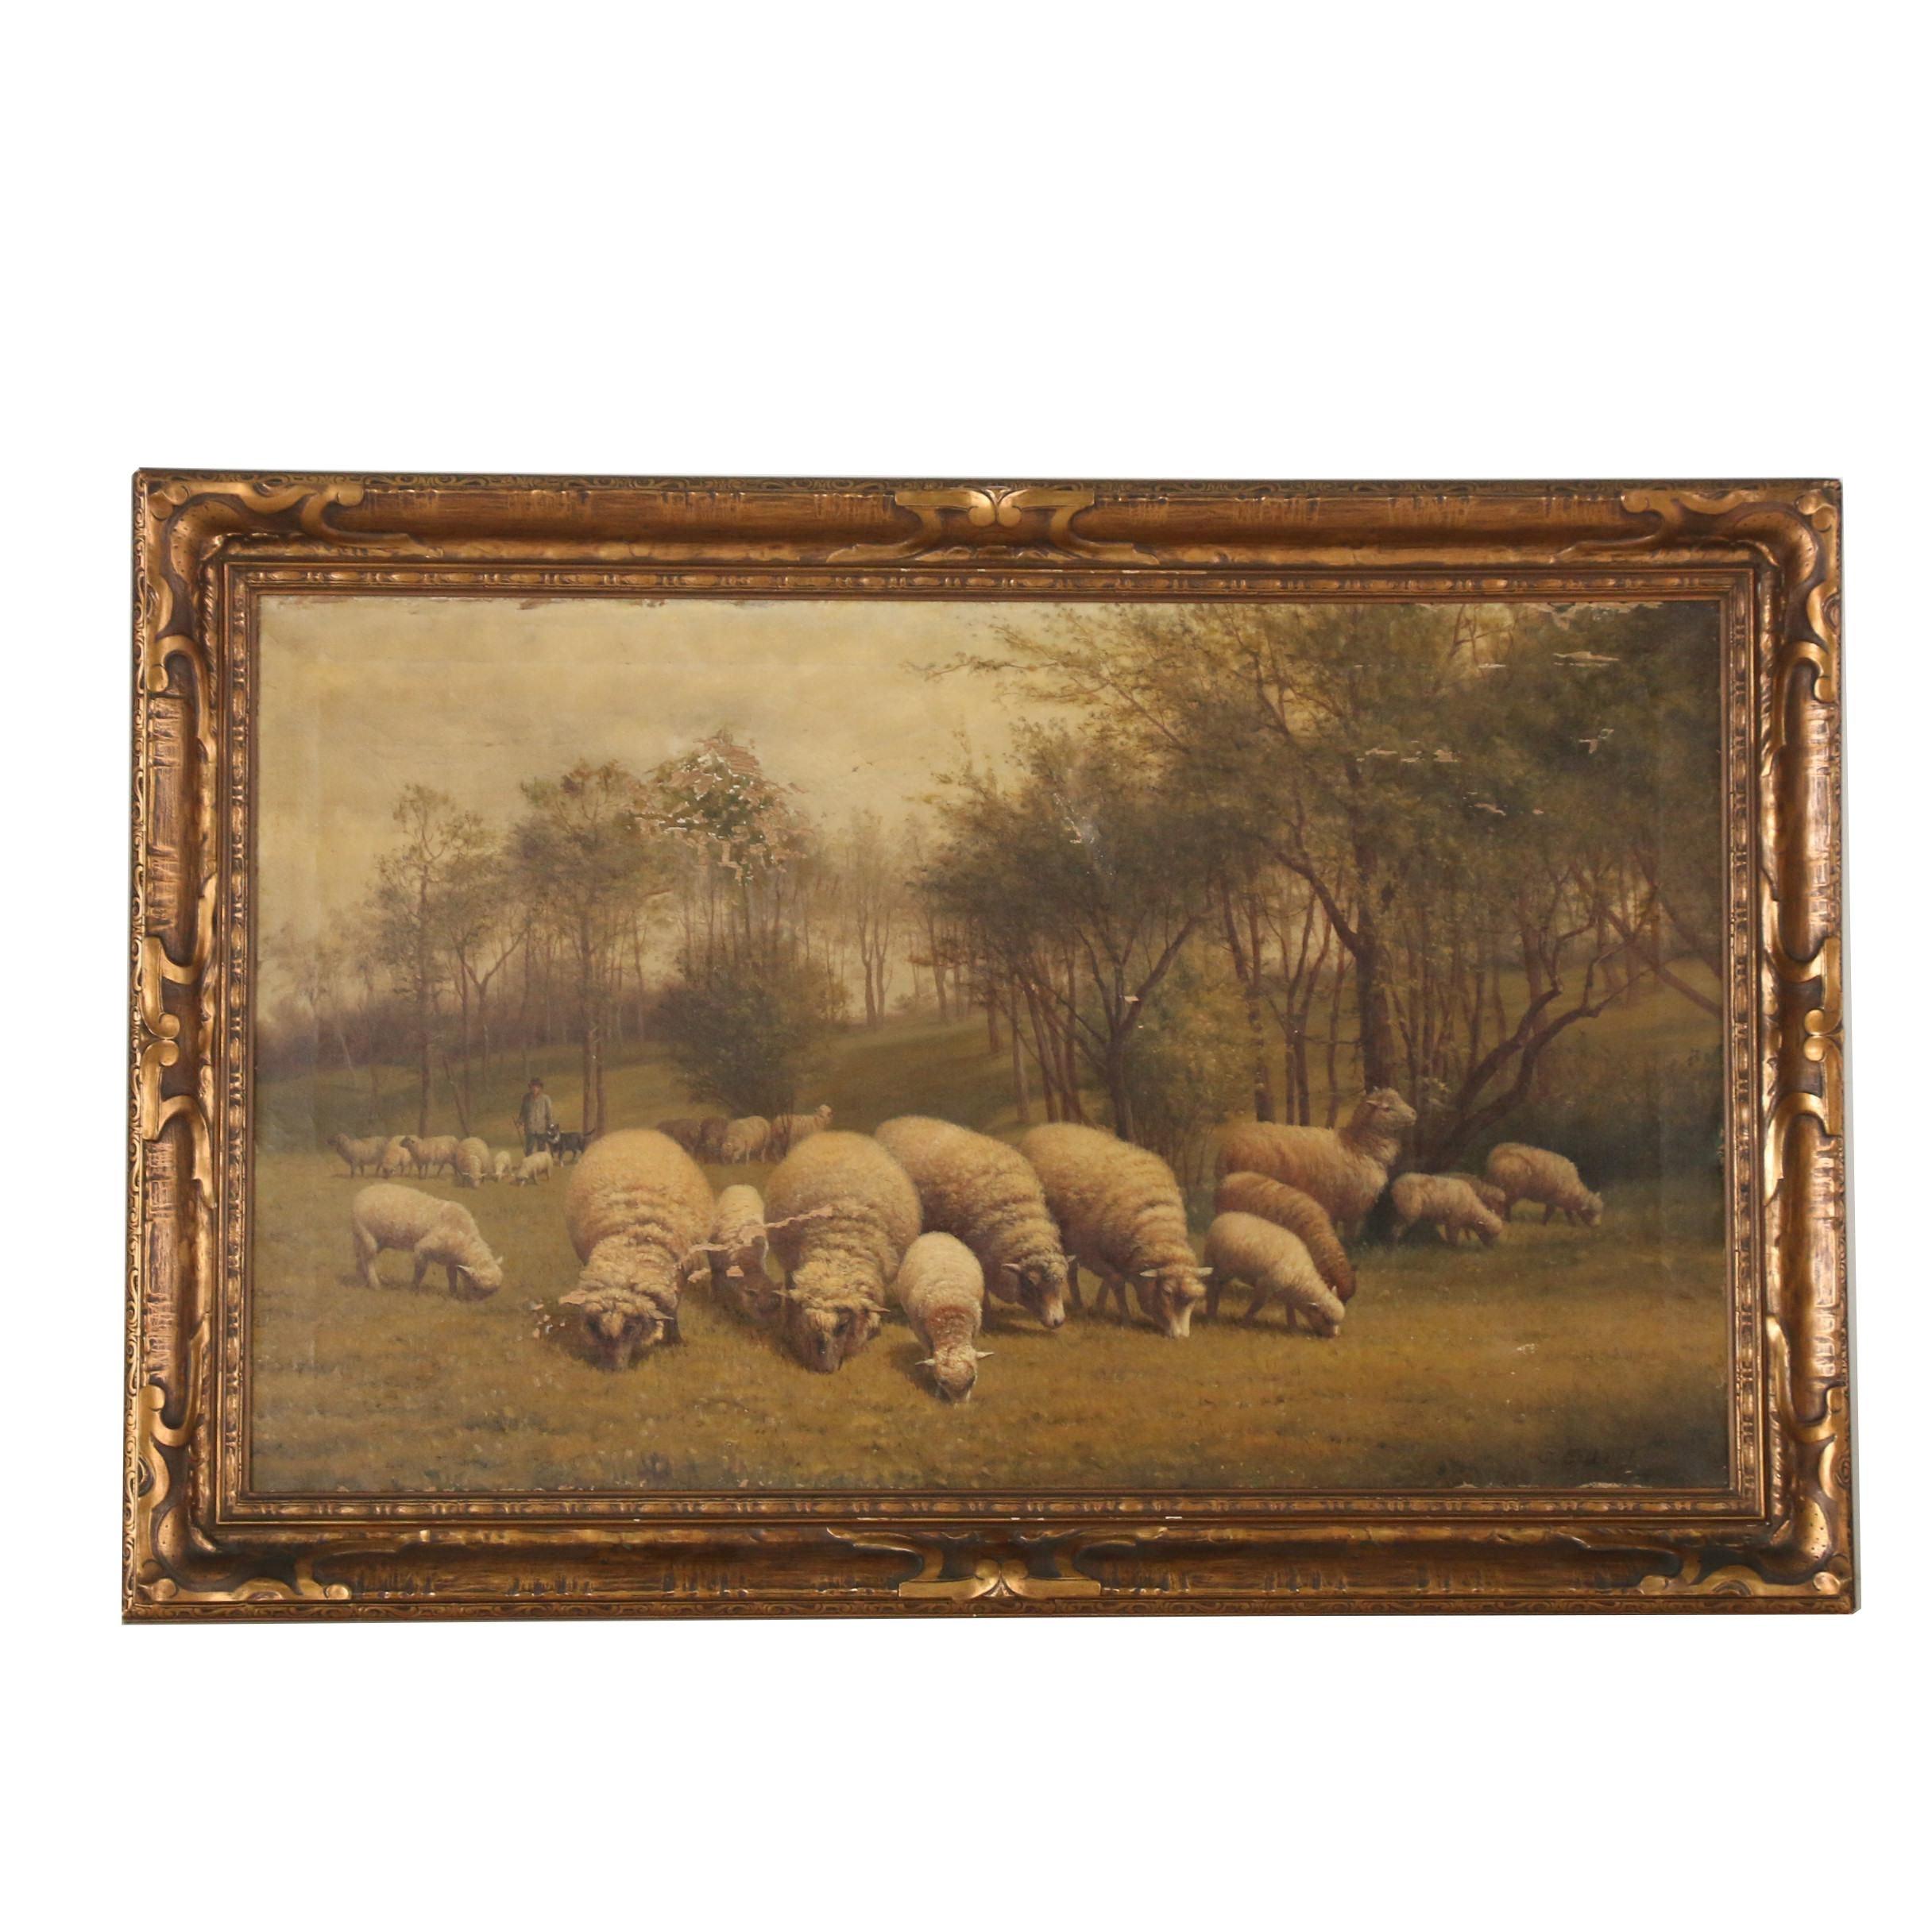 C. Gilbret Oil Painting